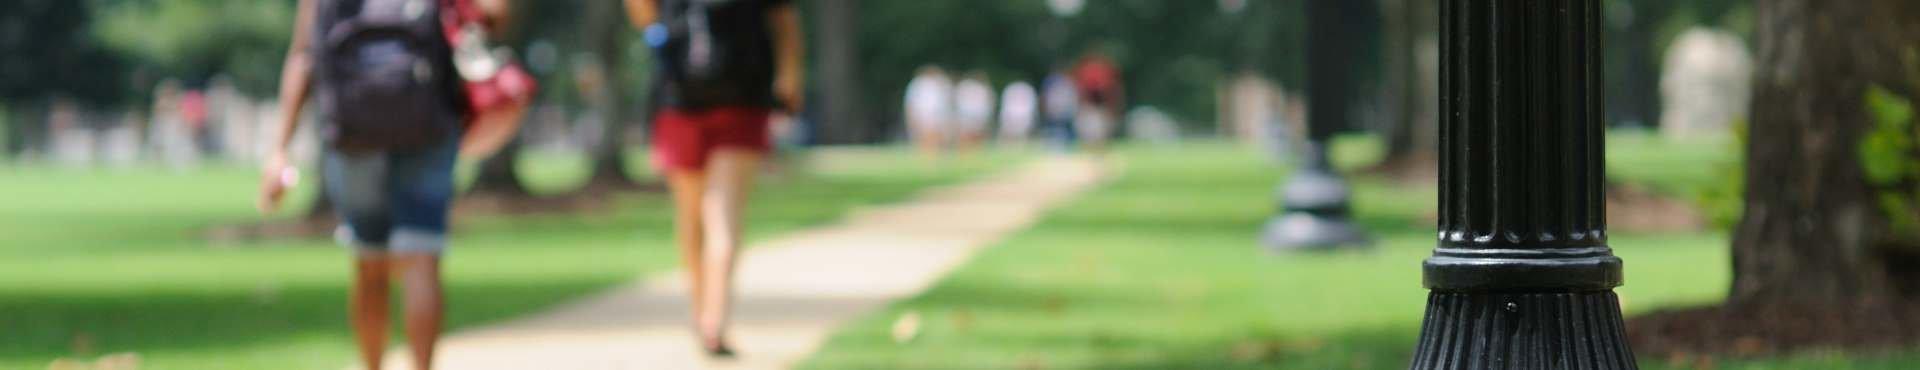 Students walking through campus | Shine Lawyers